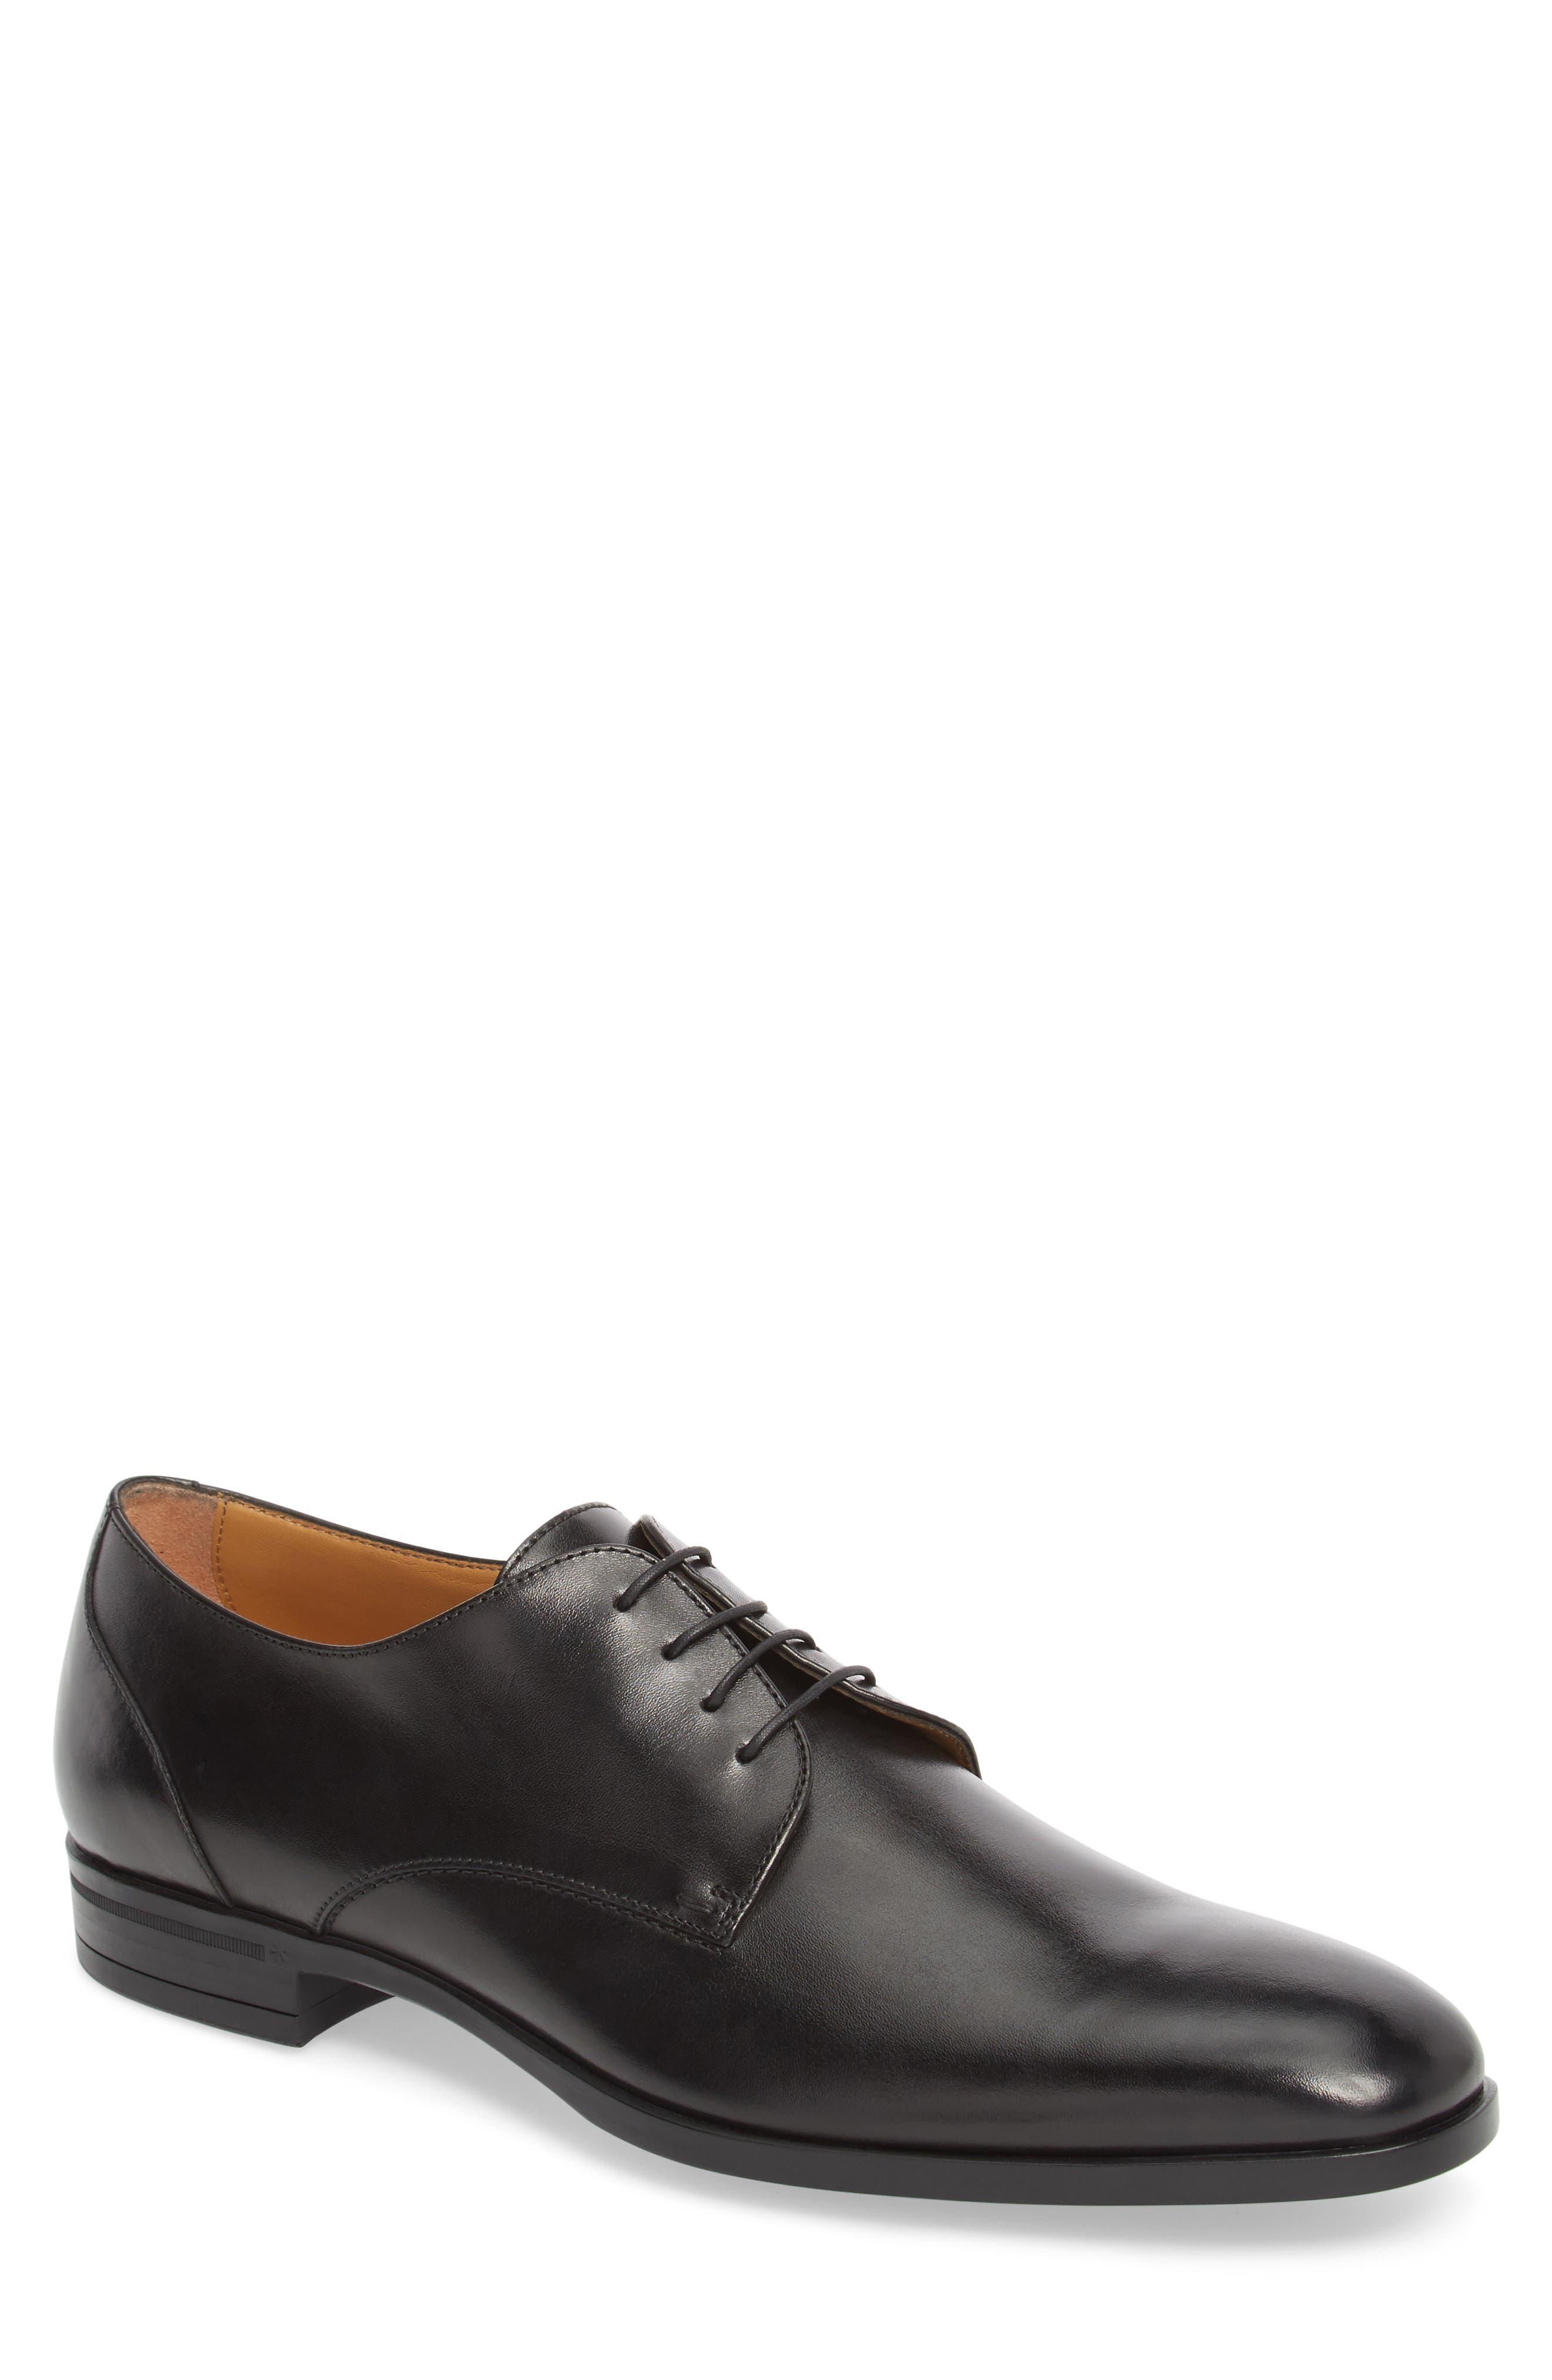 Portland Plain Toe Derby,                             Main thumbnail 1, color,                             Black Leather